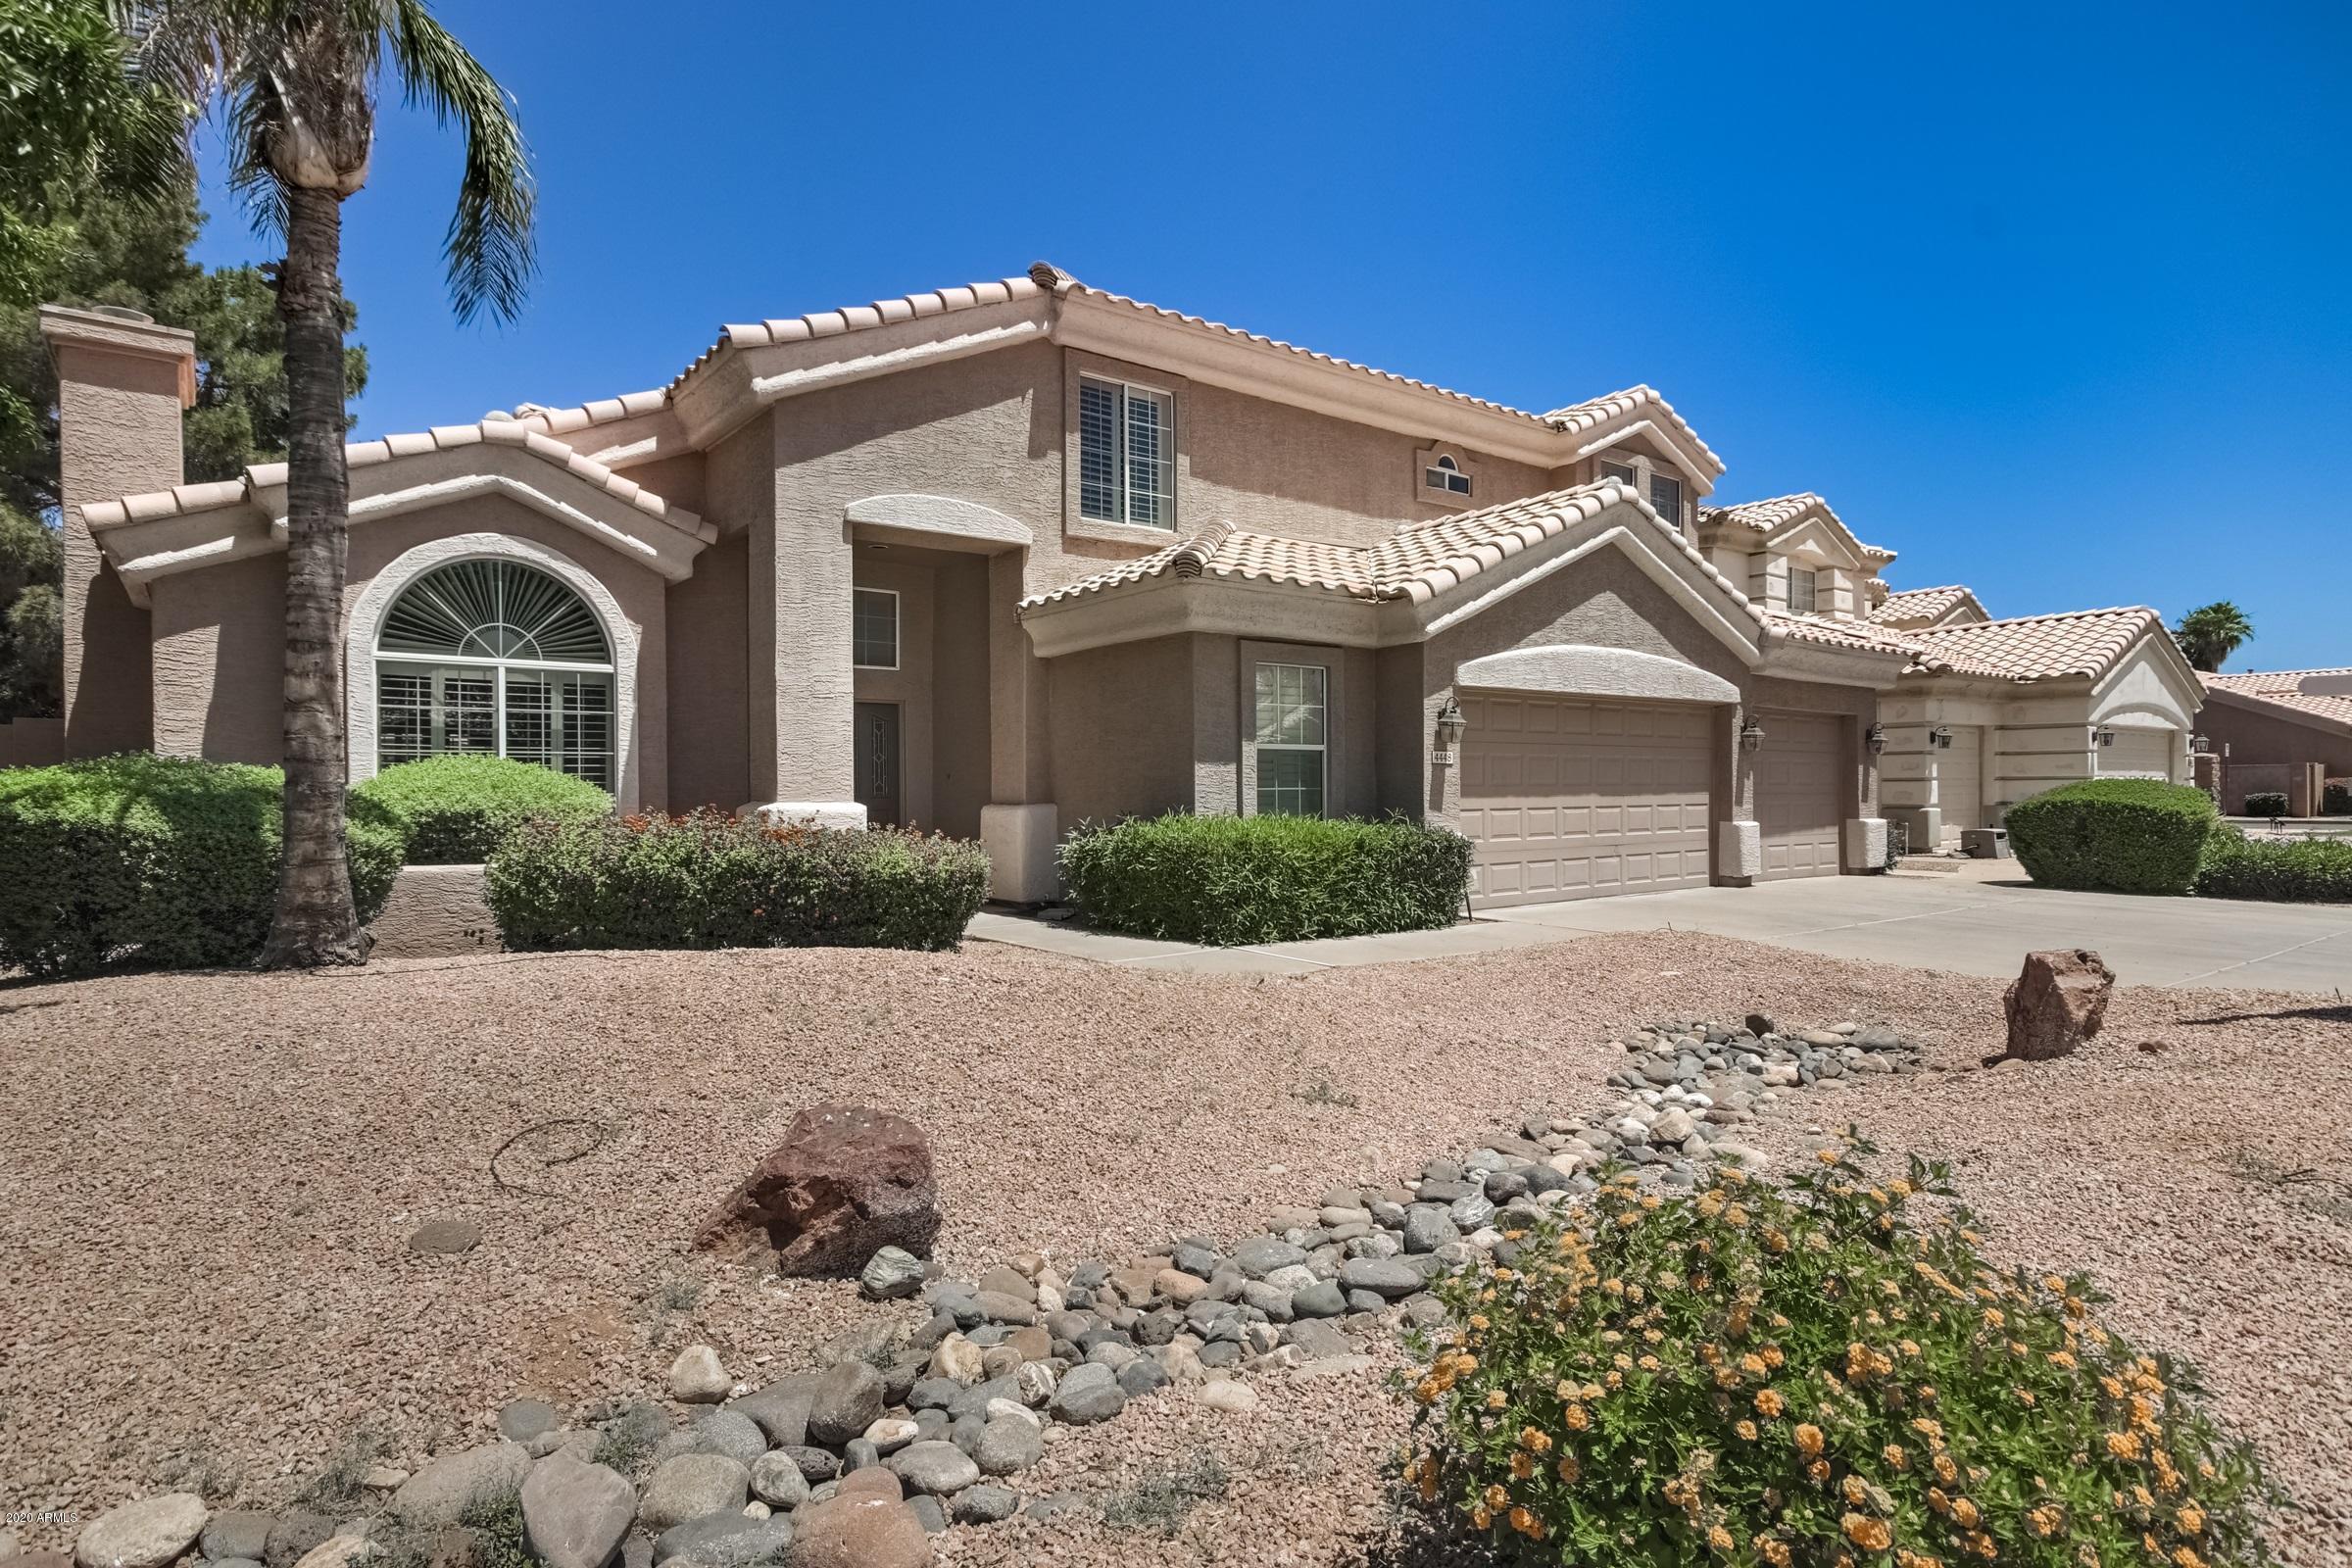 Photo of 4448 E TREMAINE Avenue, Gilbert, AZ 85234